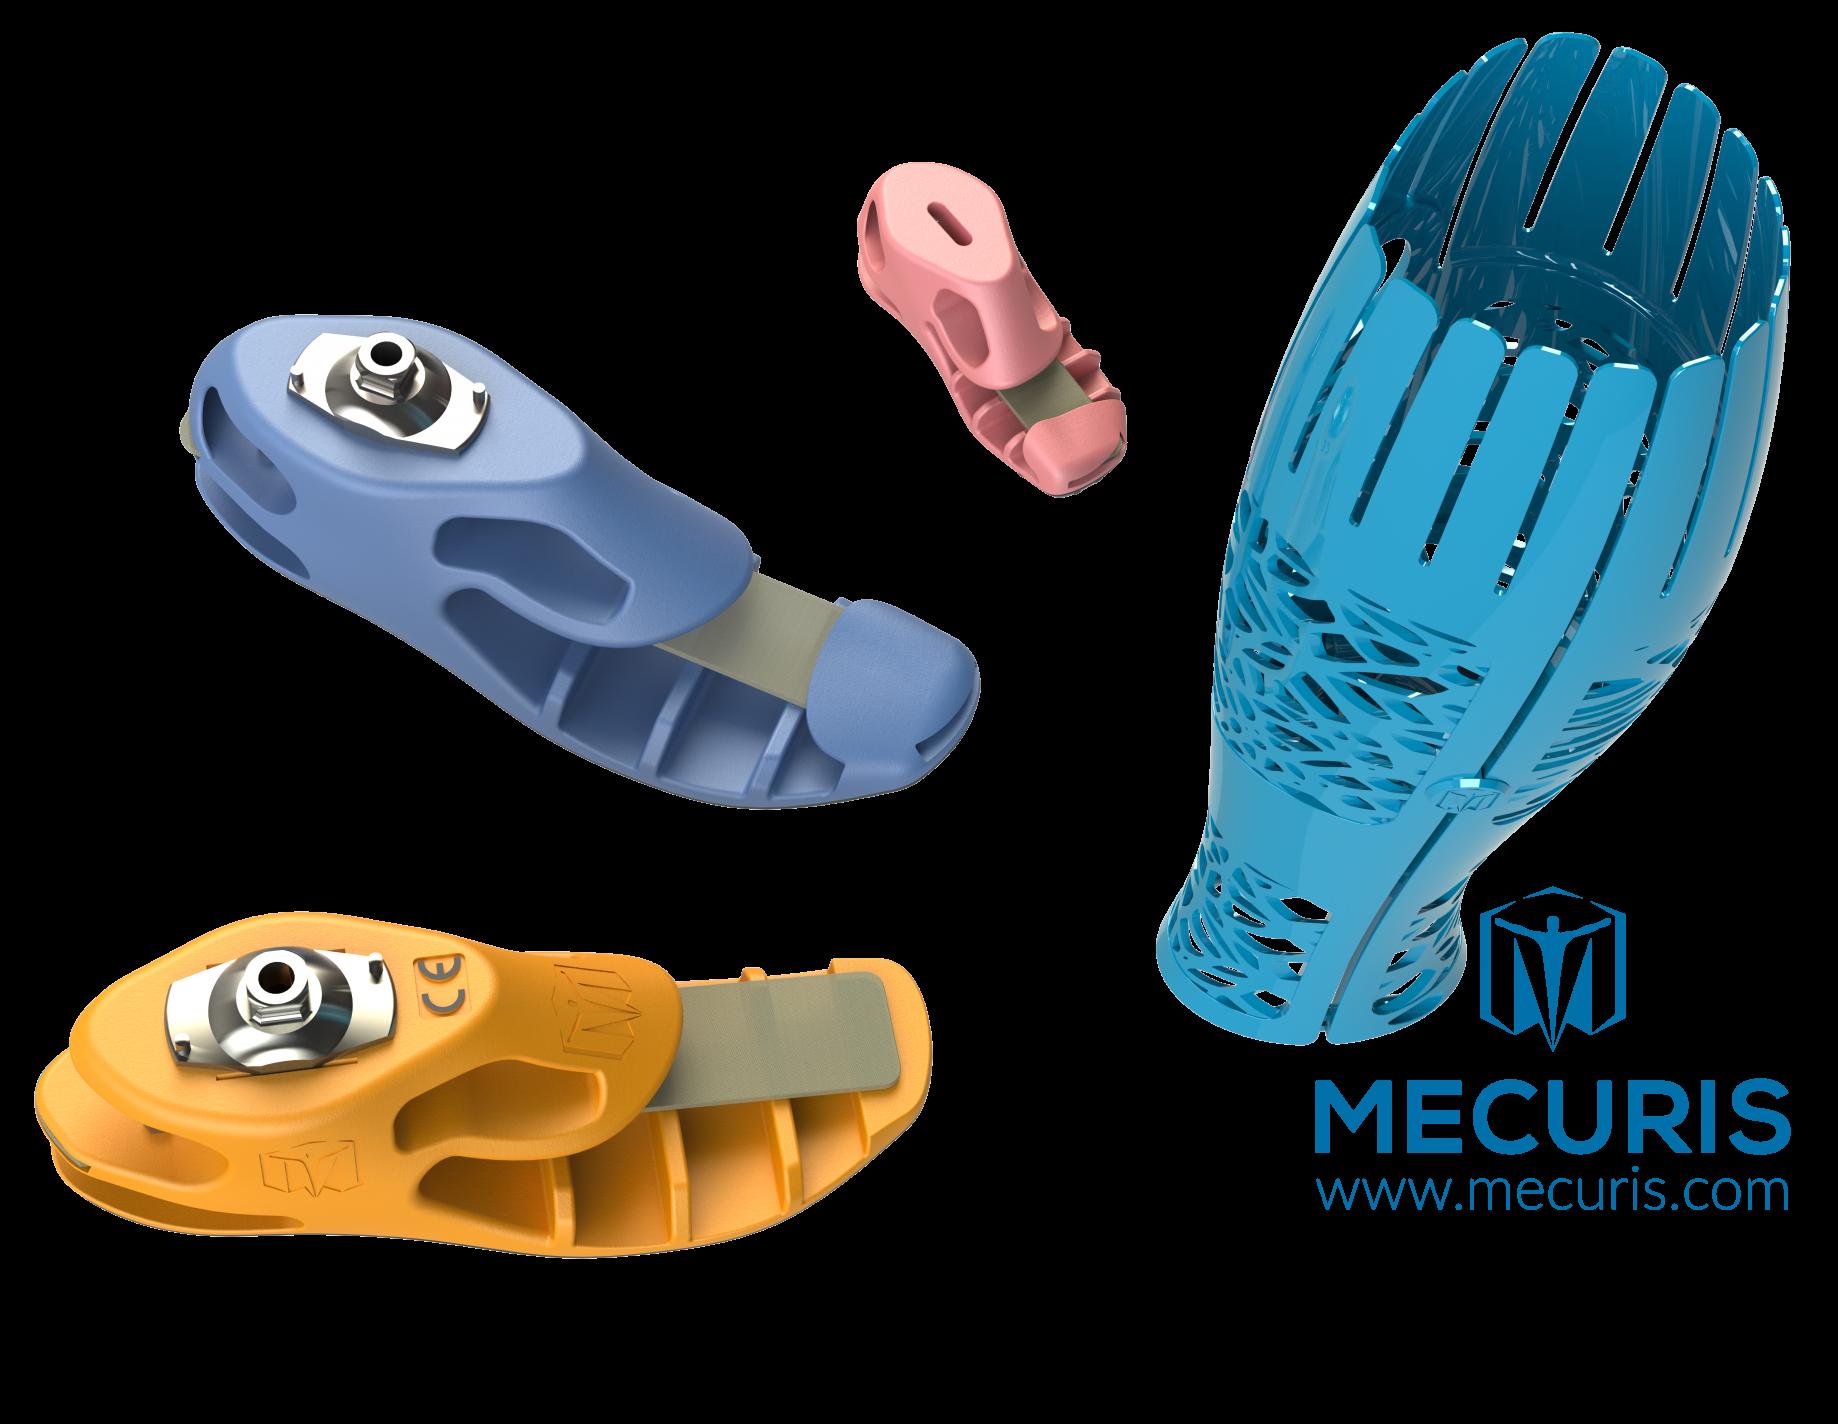 Rendering of the Mecuris prosthetic offerings. Image via Mecuris.